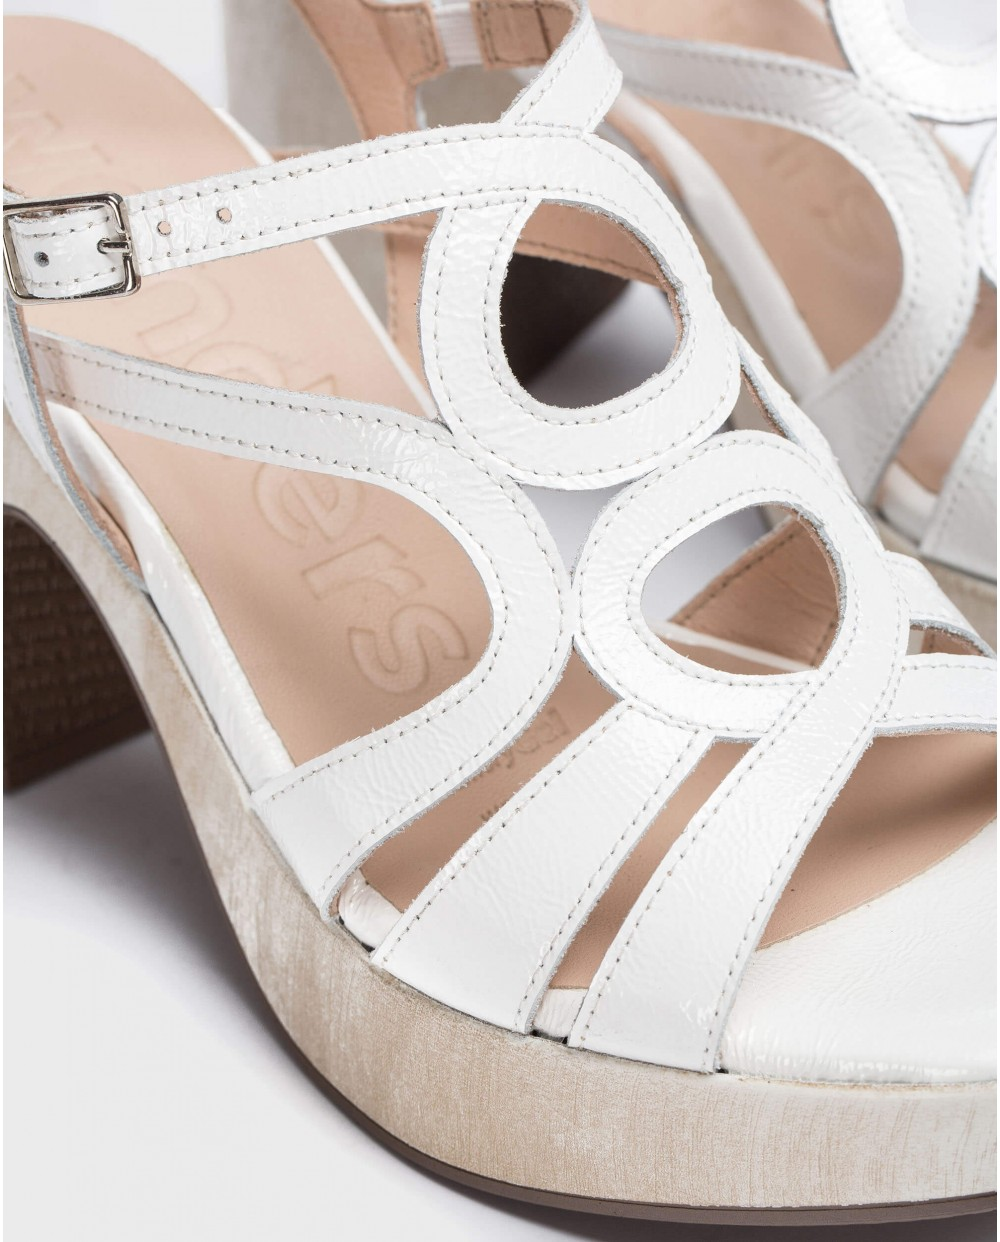 Wonders-Women-Sandal with circles